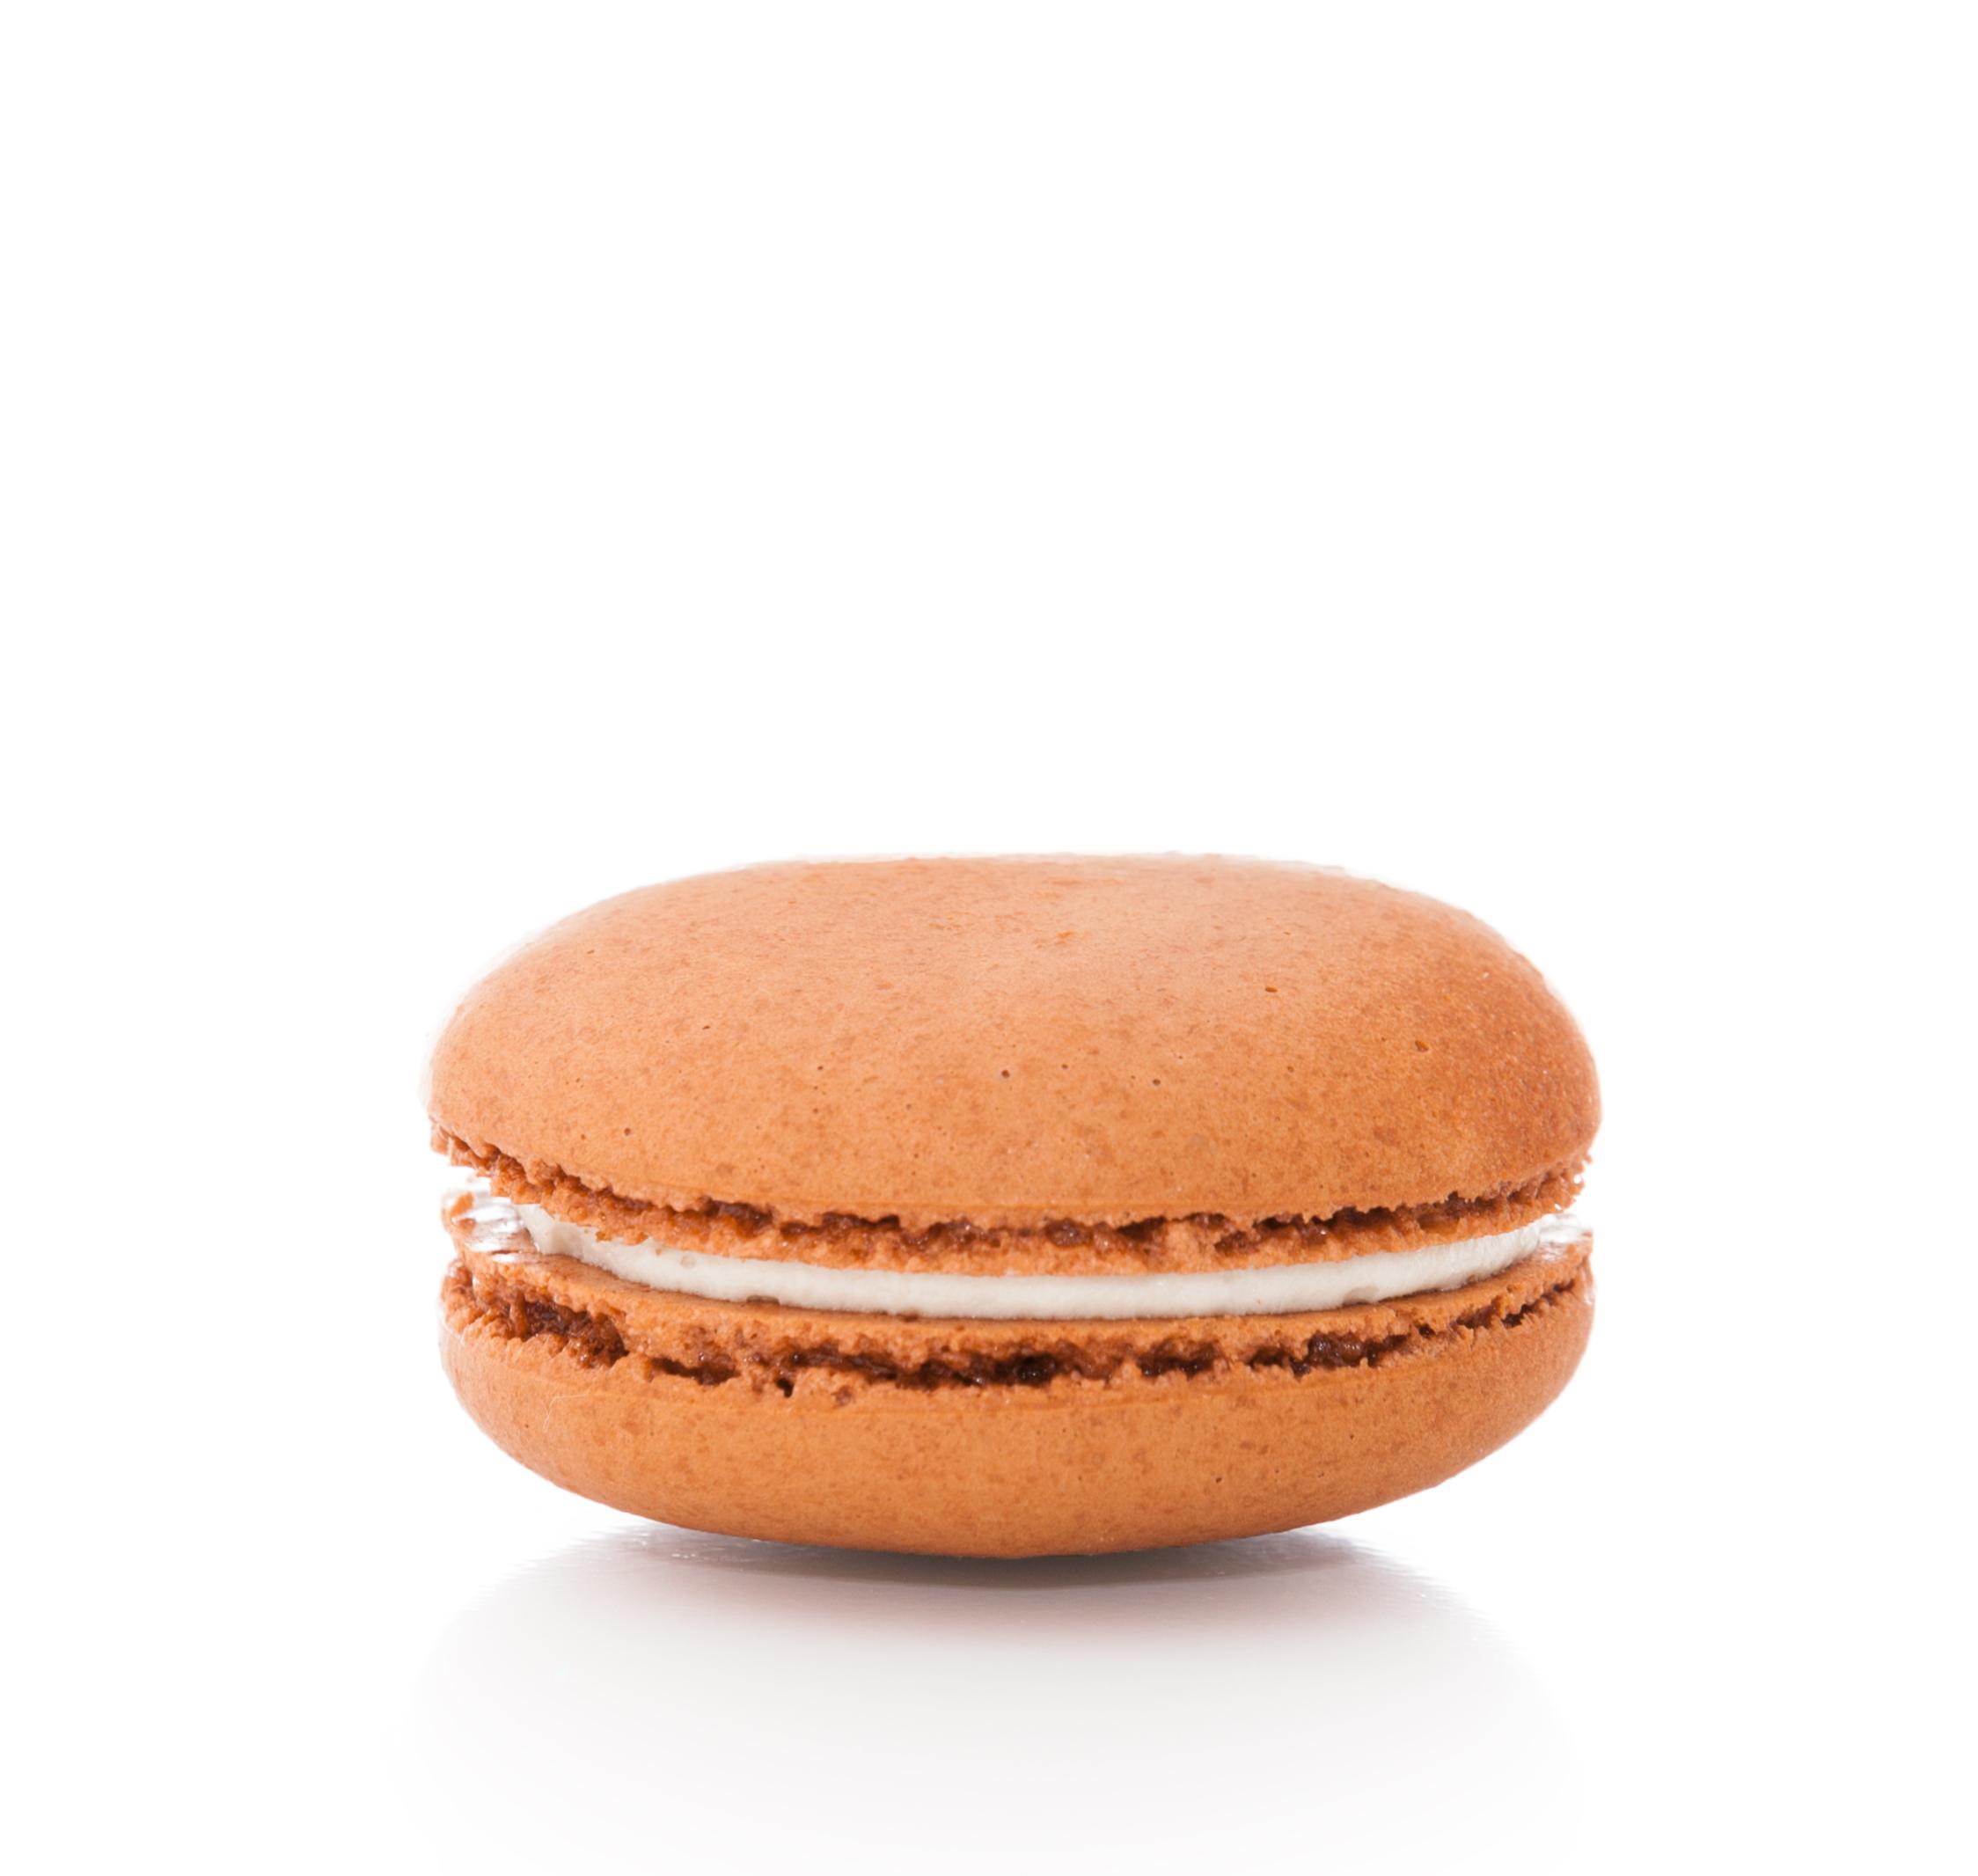 - Salted CaramelNeoclassical buttercream with rich caramel and a hint of sea salt